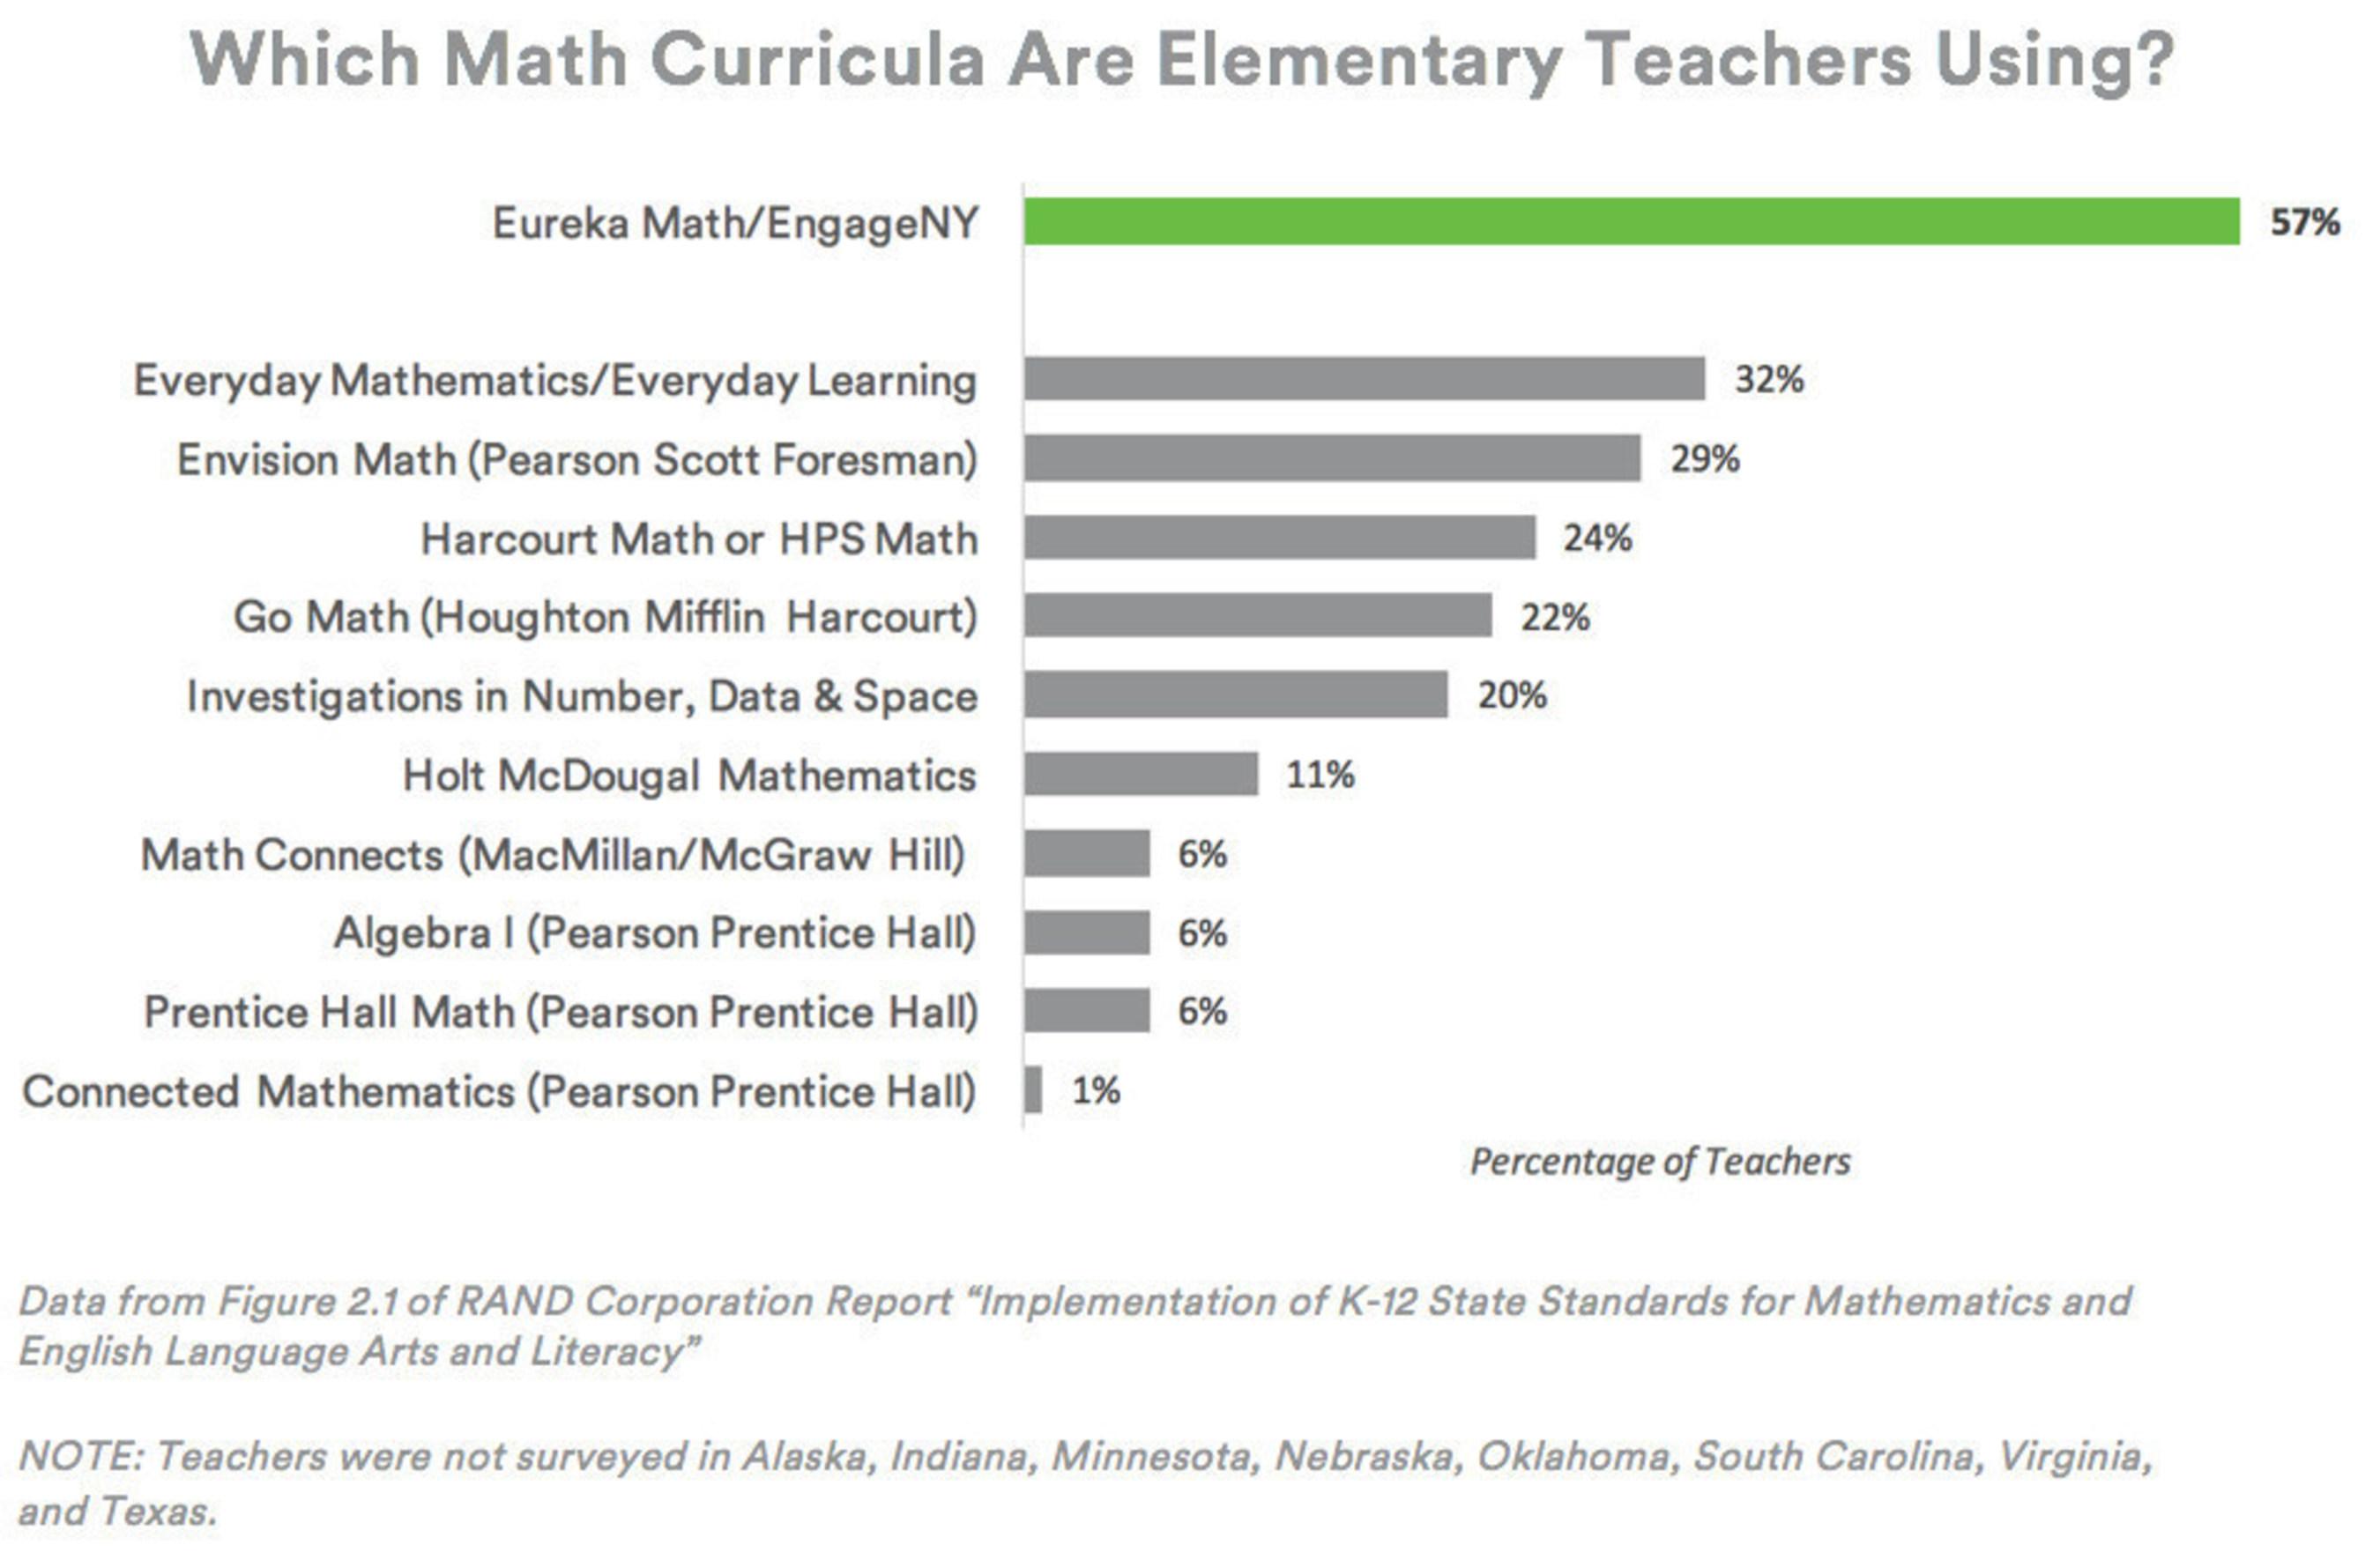 What Math Curricula Are Elementary Teachers Using?